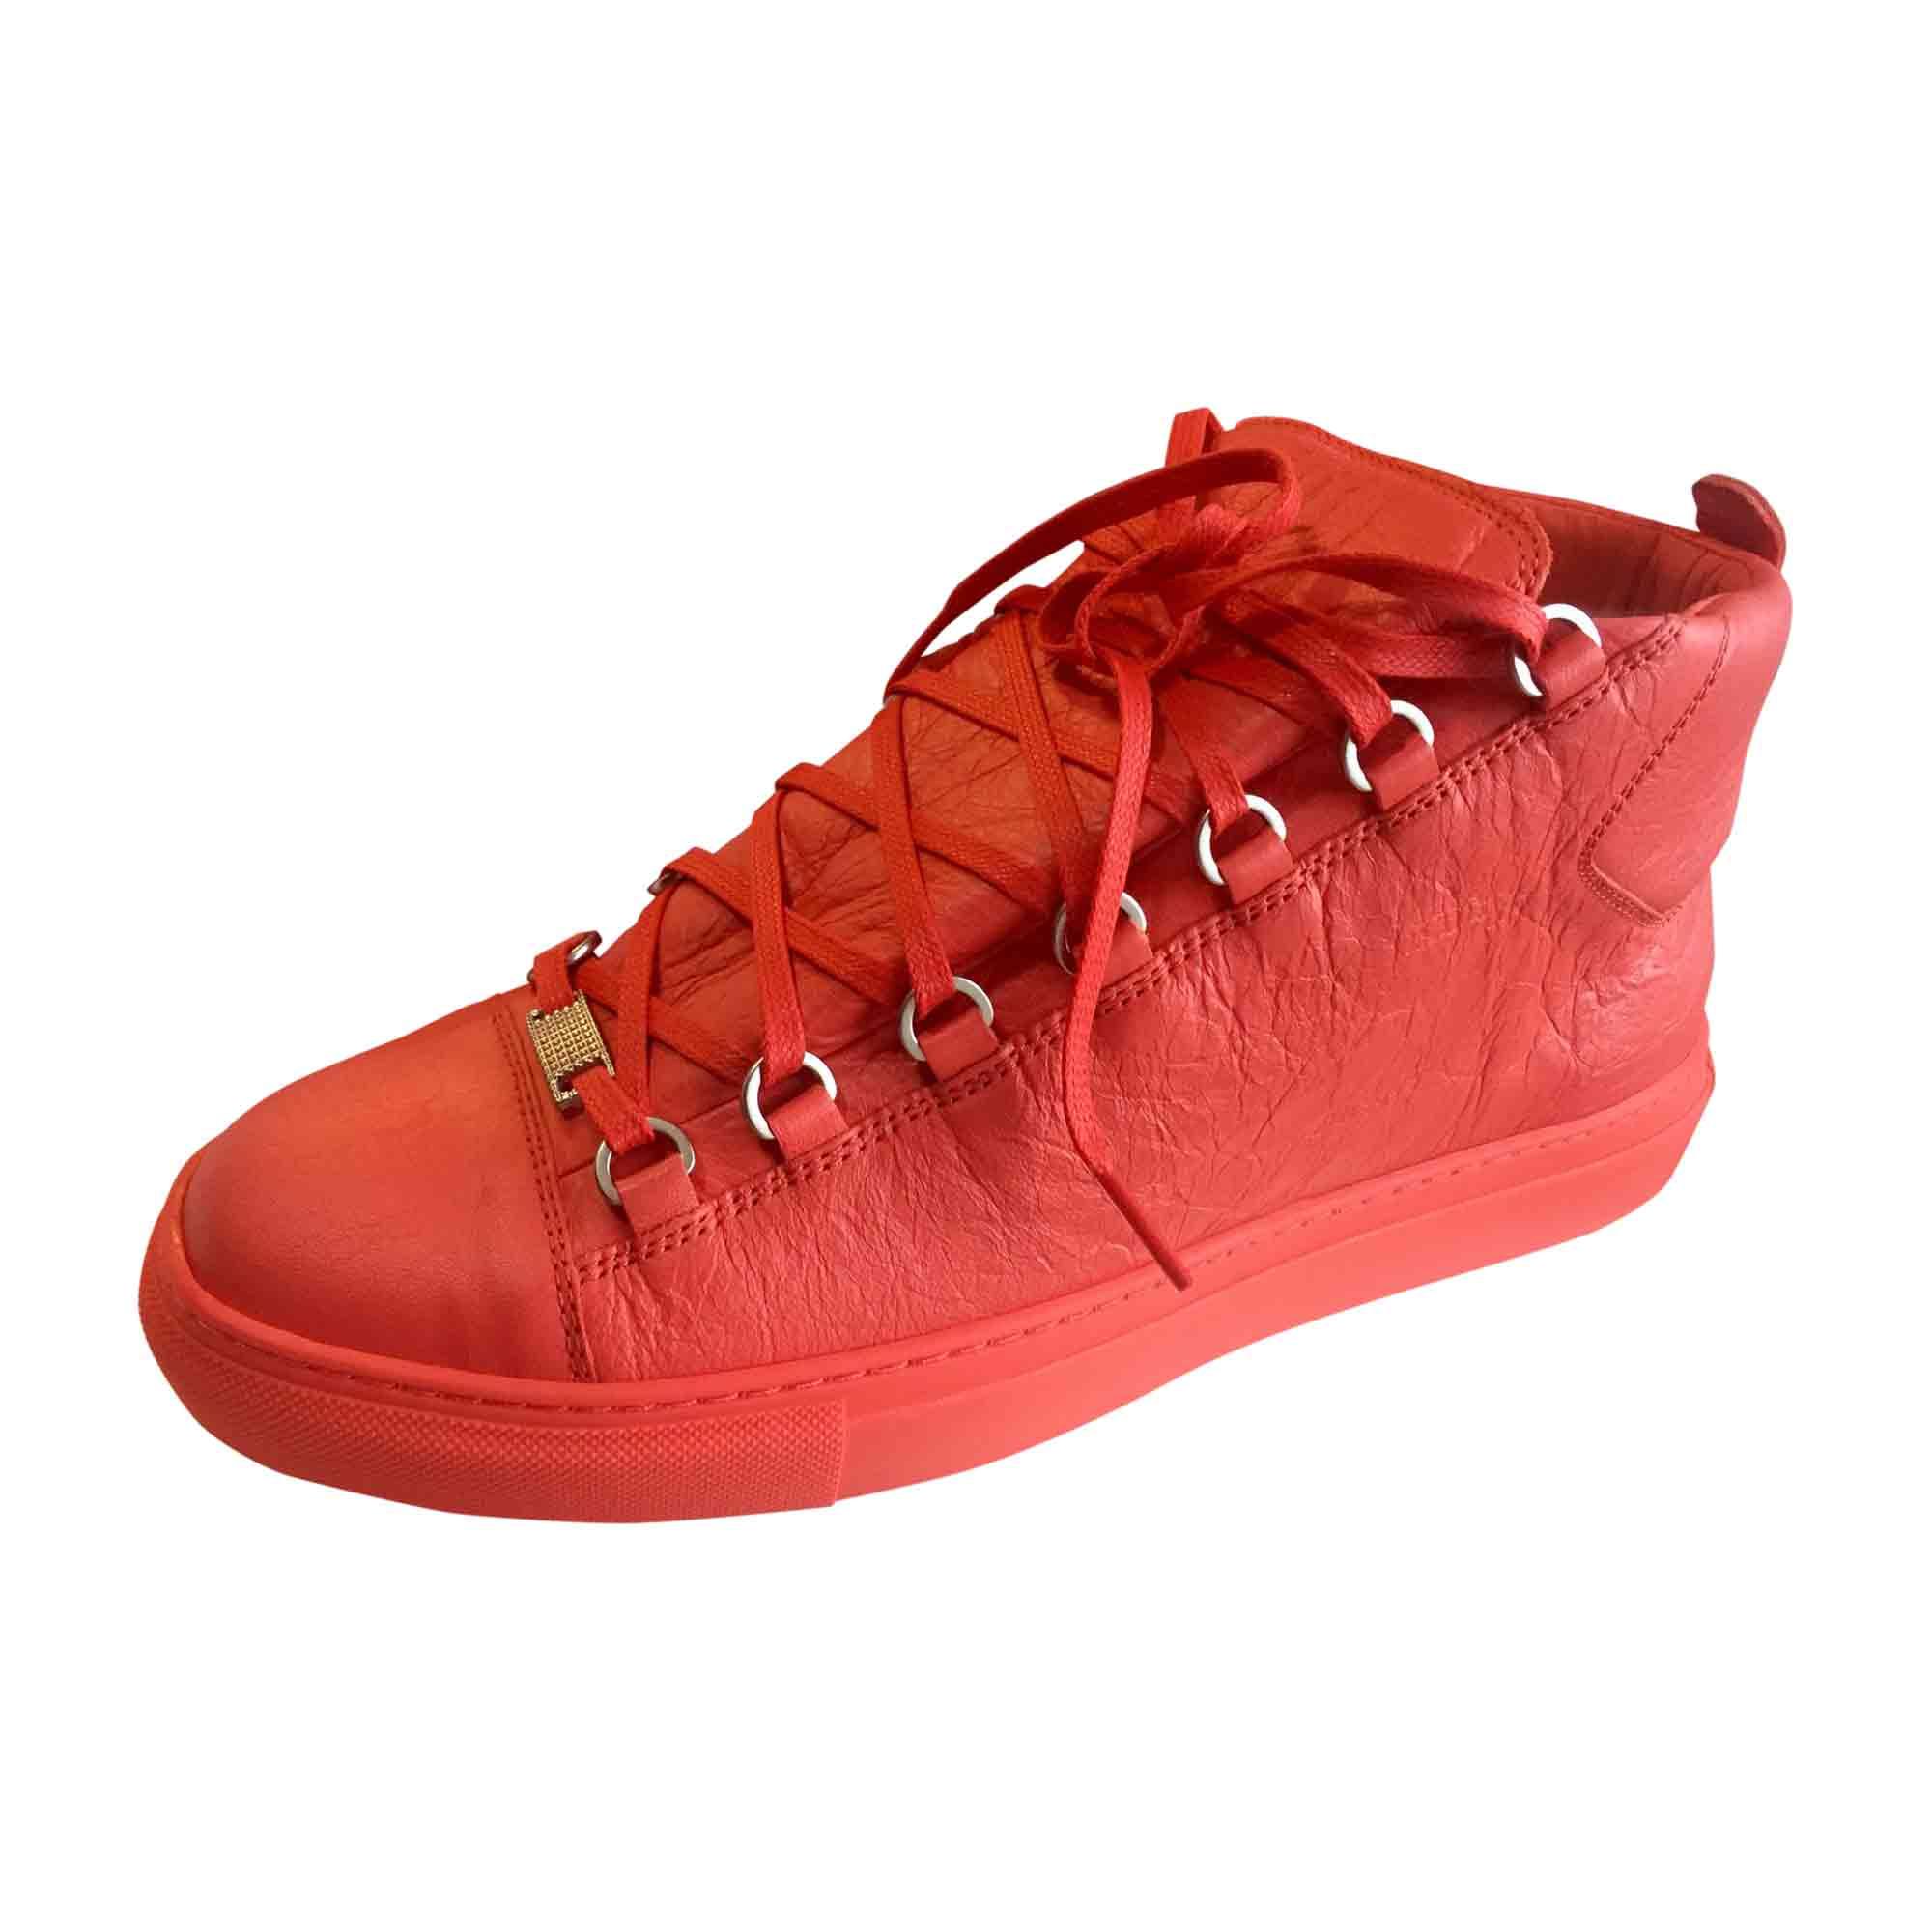 fa4b189e41 Baskets BALENCIAGA 39 rouge vendu par Walidou175448 - 5656839